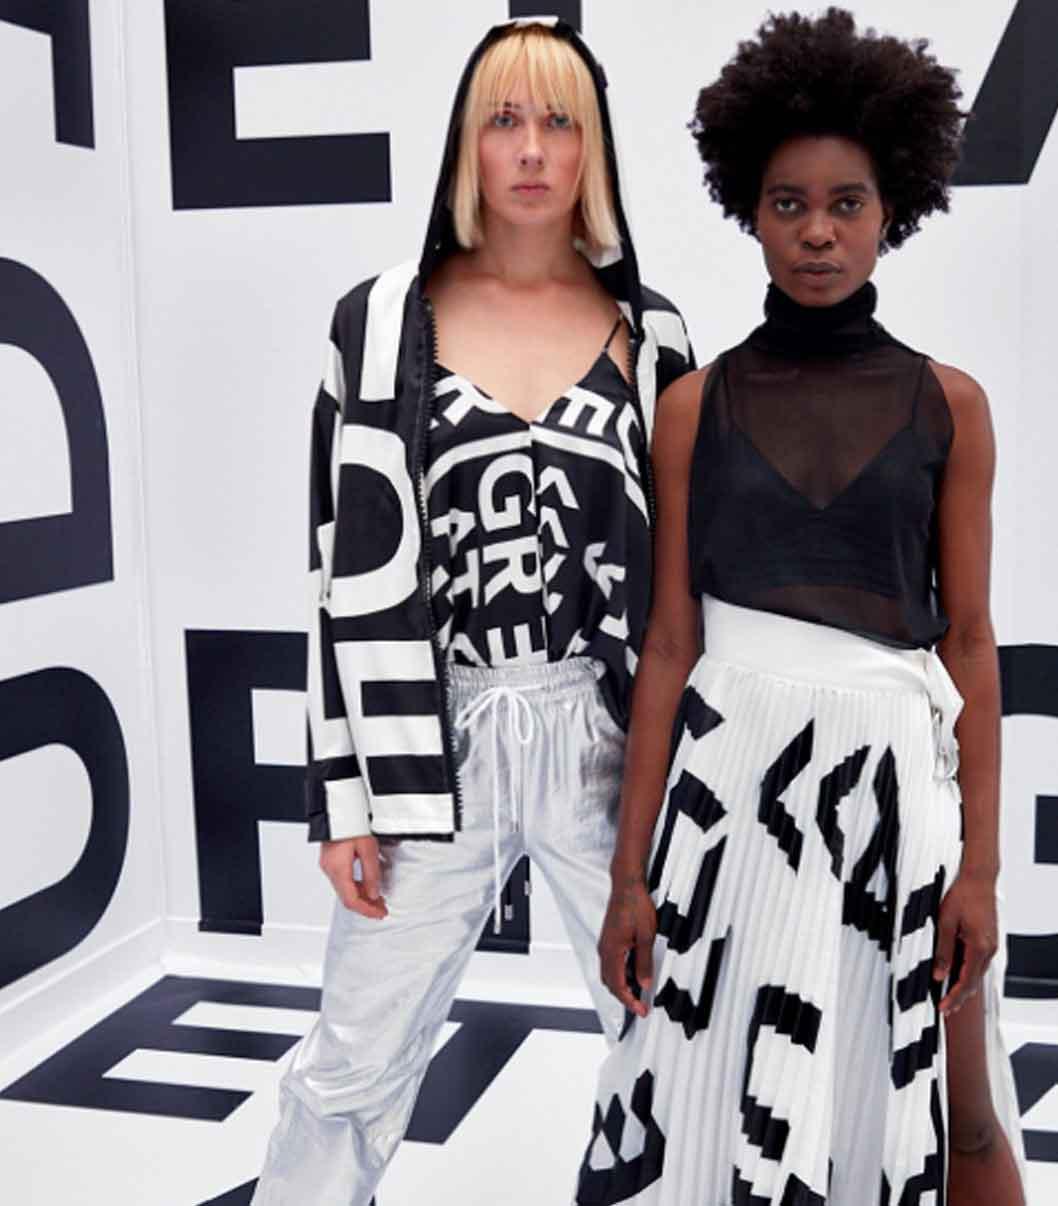 BLSSD SUSTAINABLE ETHICAL FASHION BRAND ARABIA UAE DUBAI good fashion guide ECOLOOKBOOK